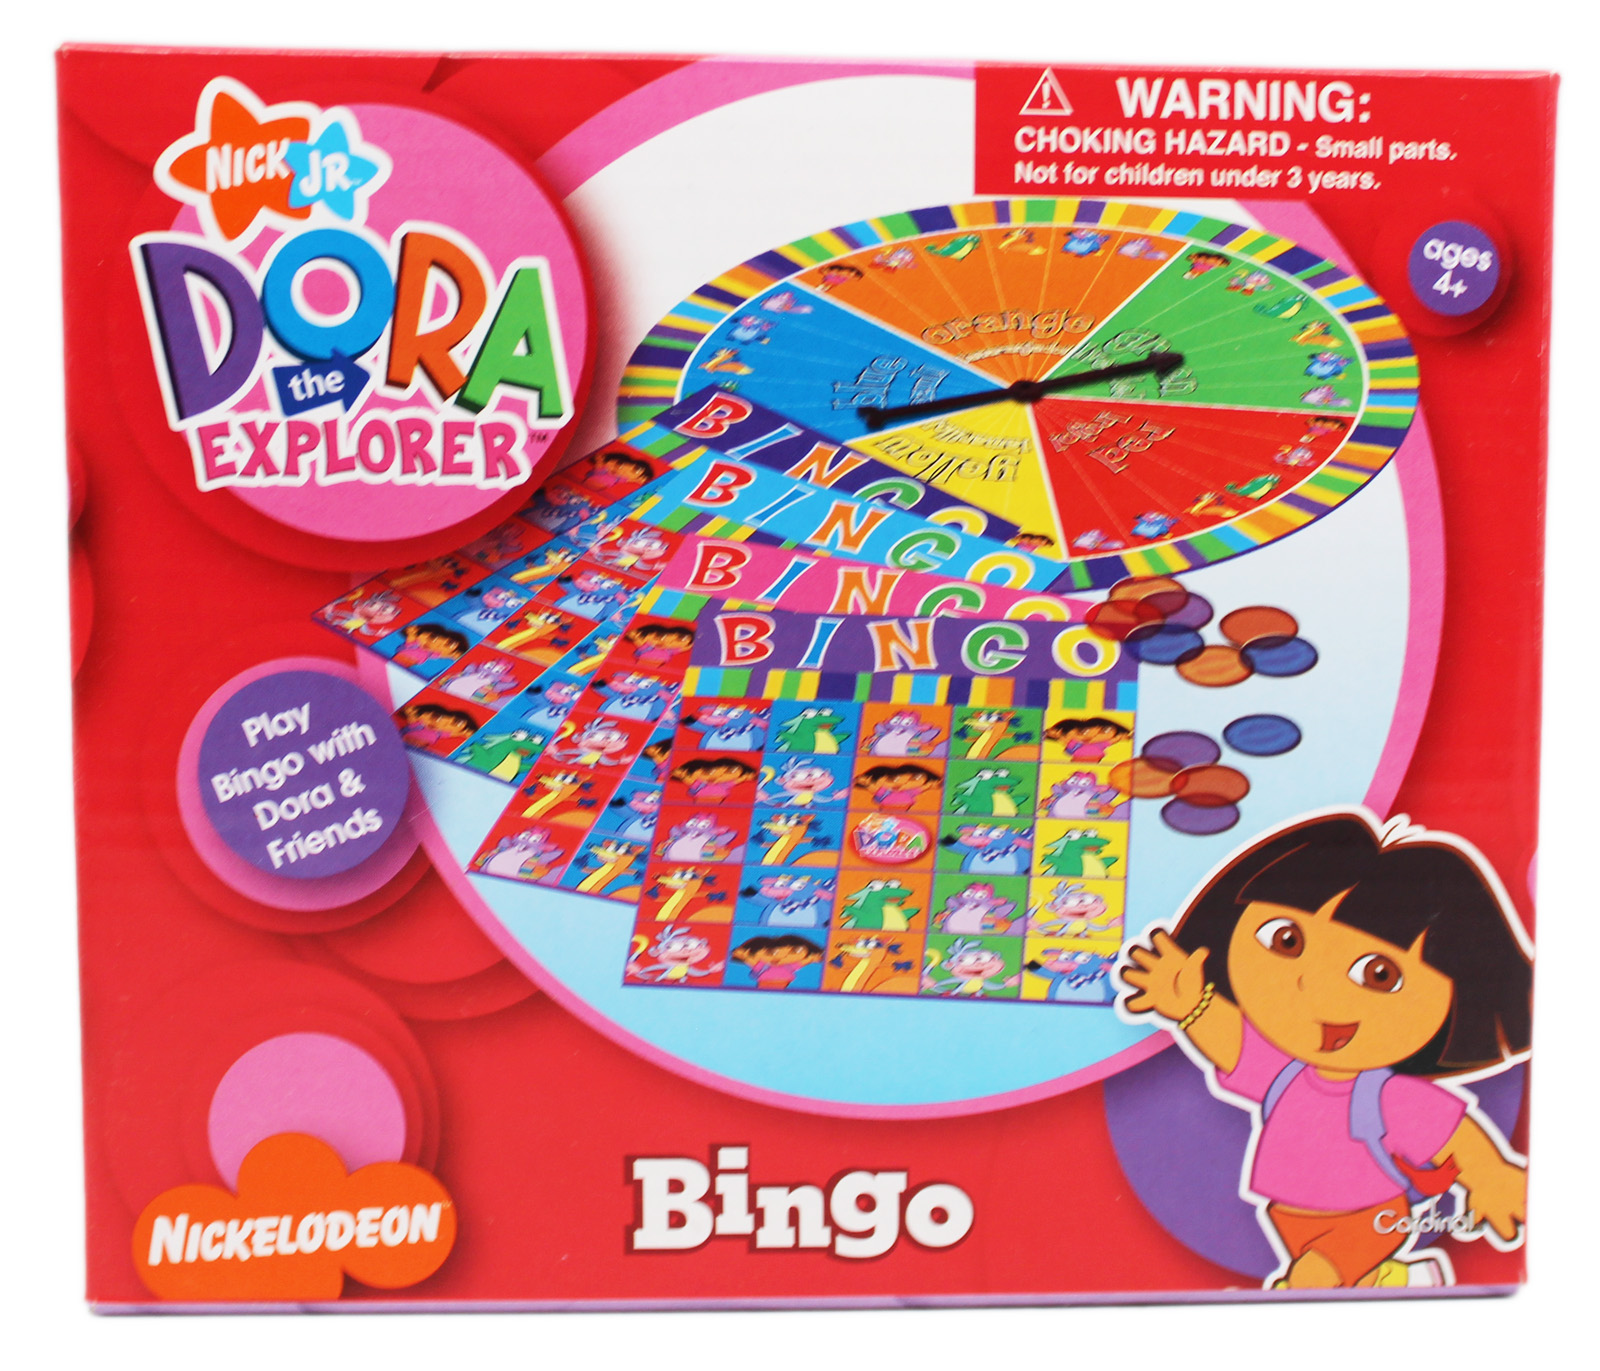 Dora the Explorer Kids Wheel Based Bingo Set (4 Player) by